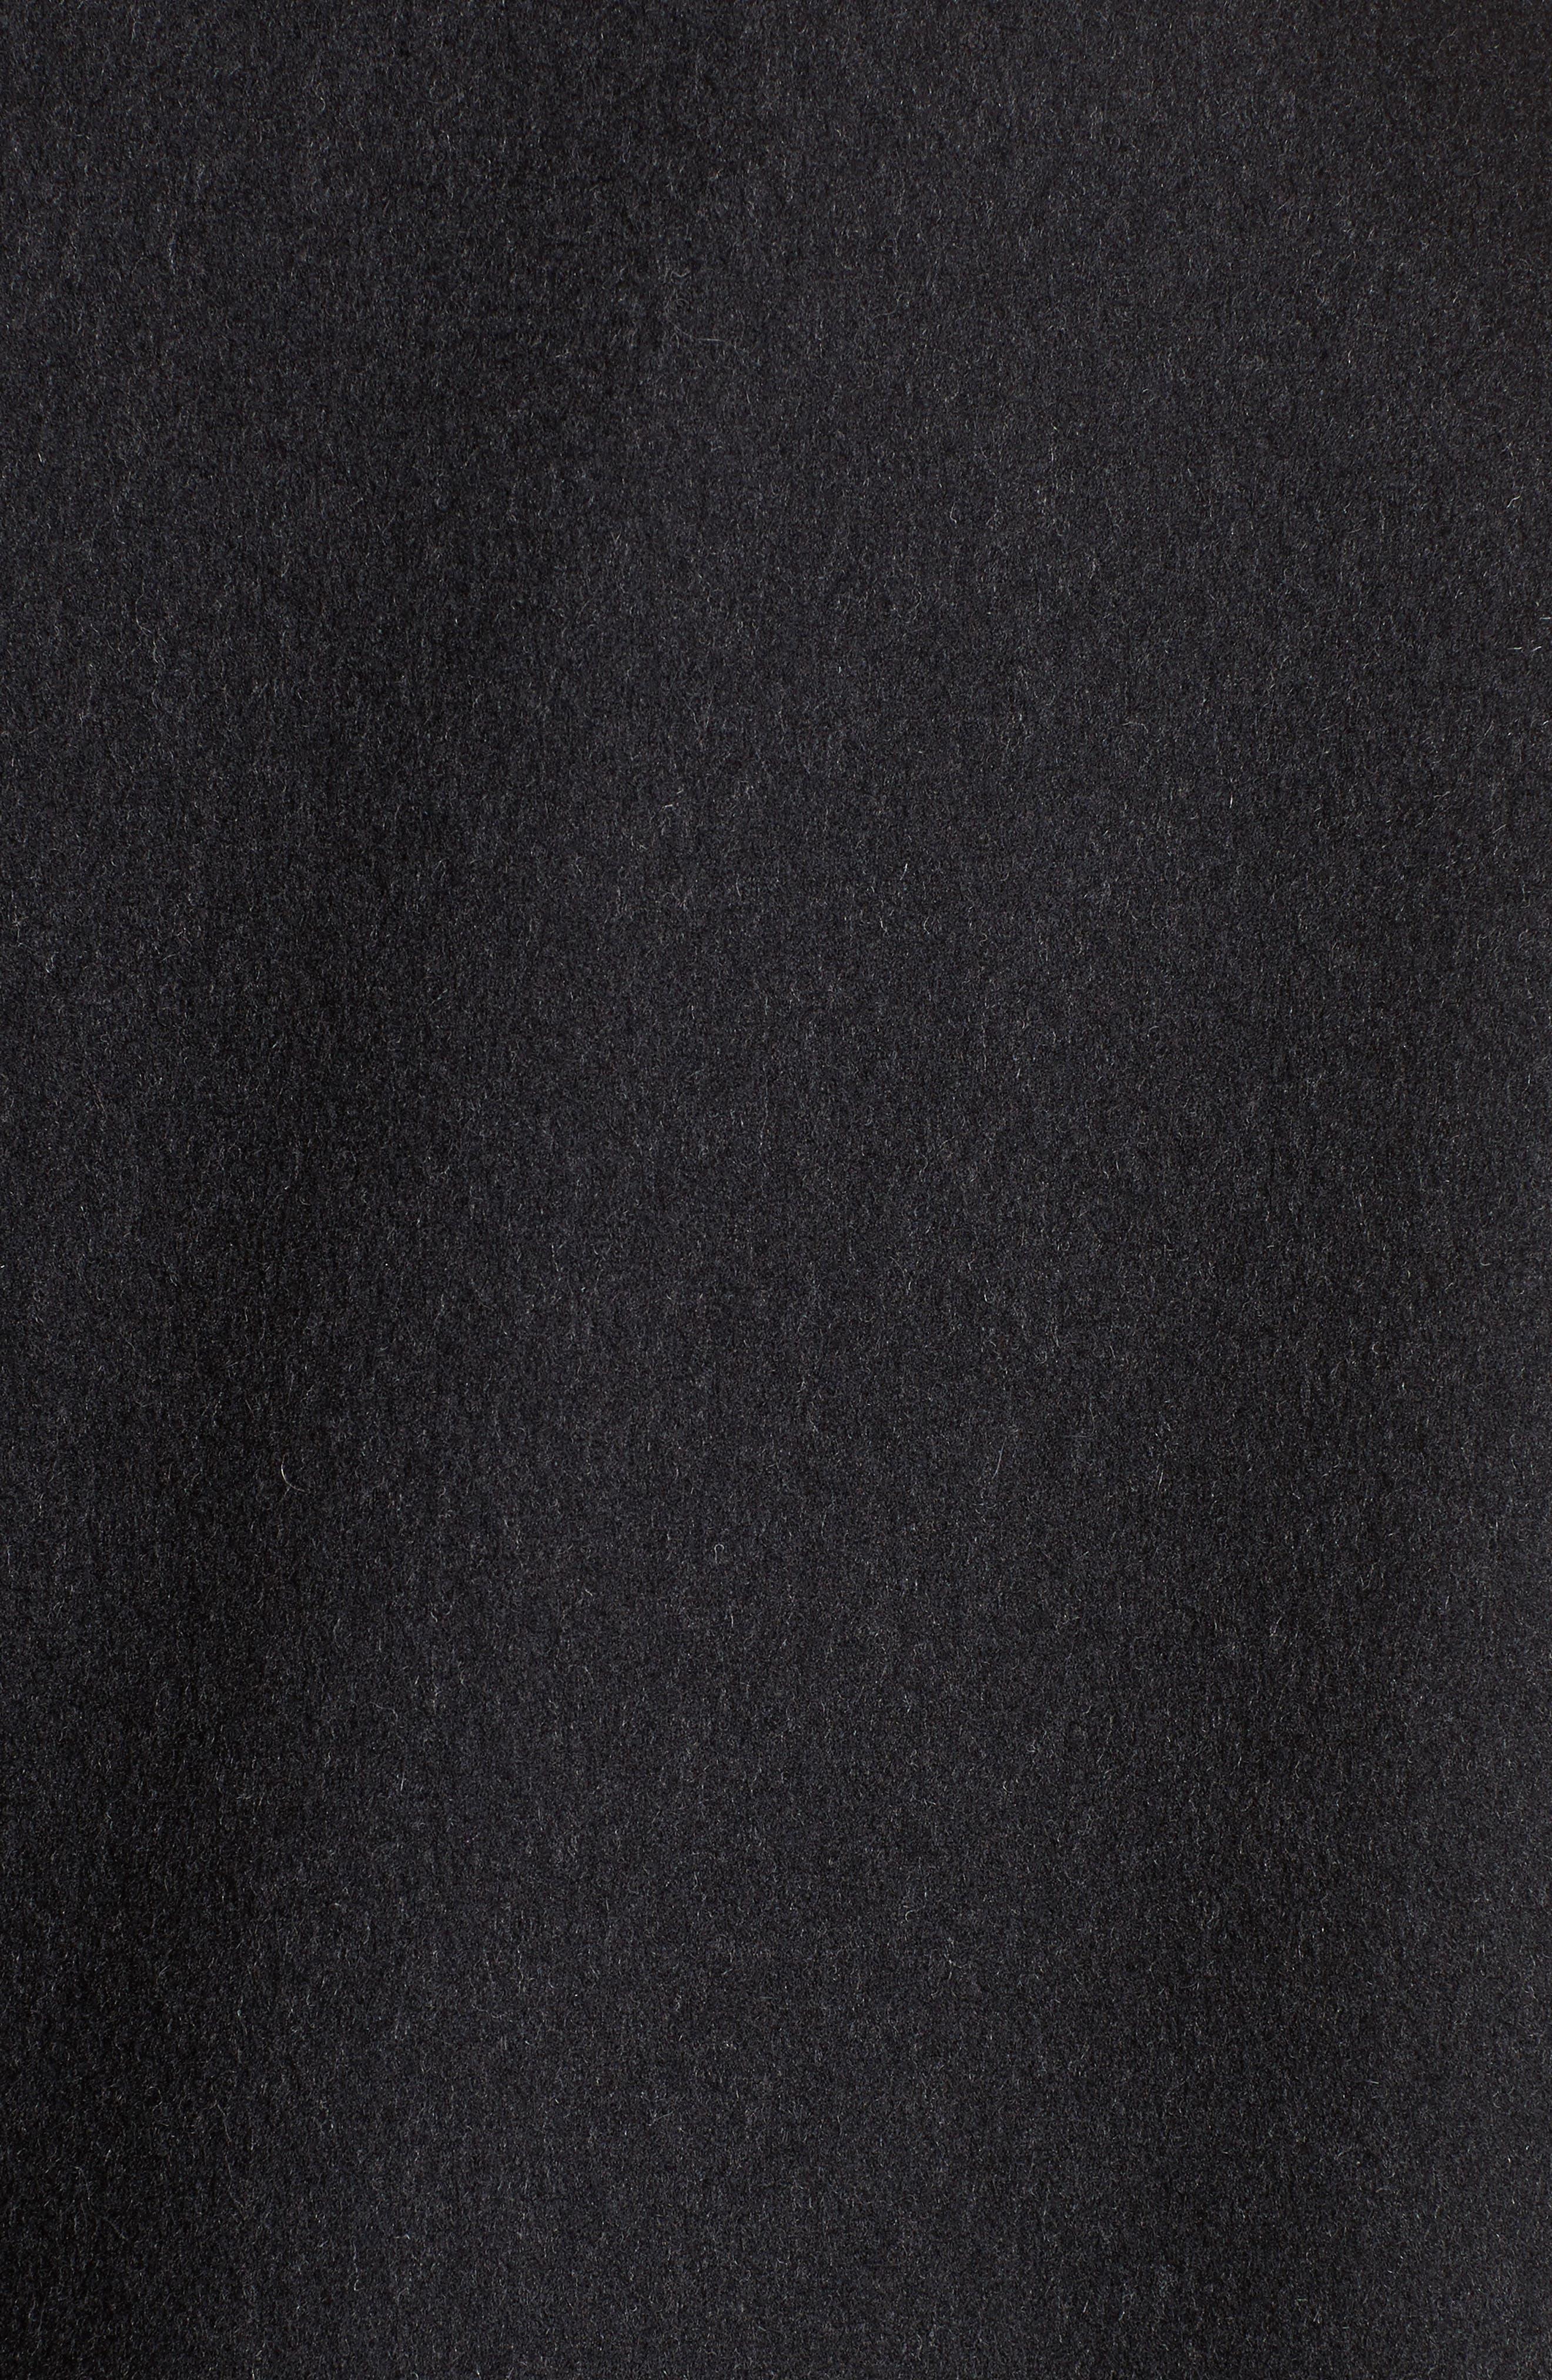 Genuine Fox Fur Trim Wool Blend Coat,                             Alternate thumbnail 6, color,                             001